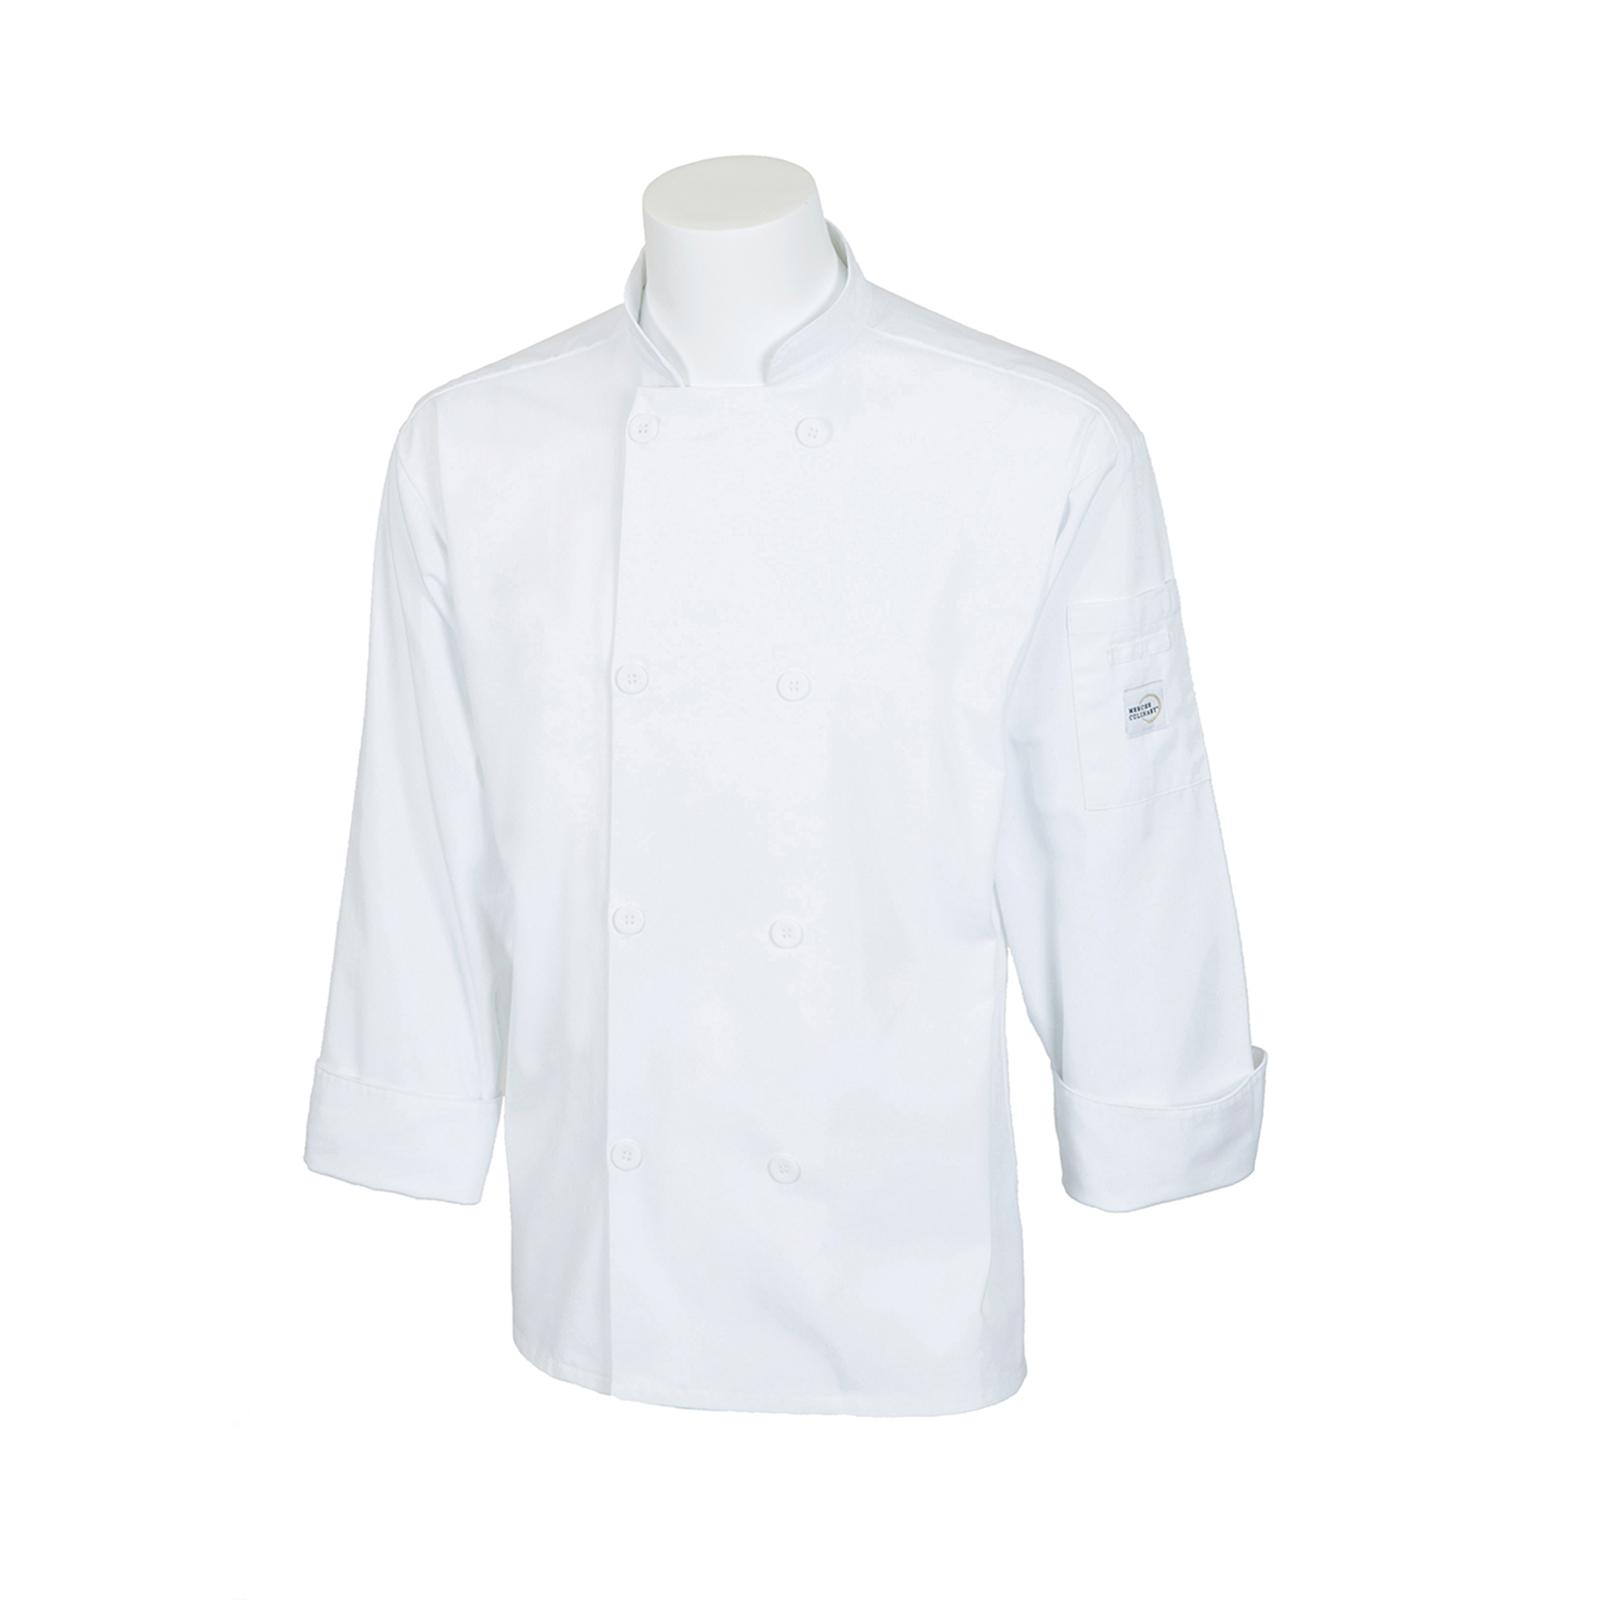 Mercer Culinary M60010WH5X chef's coat